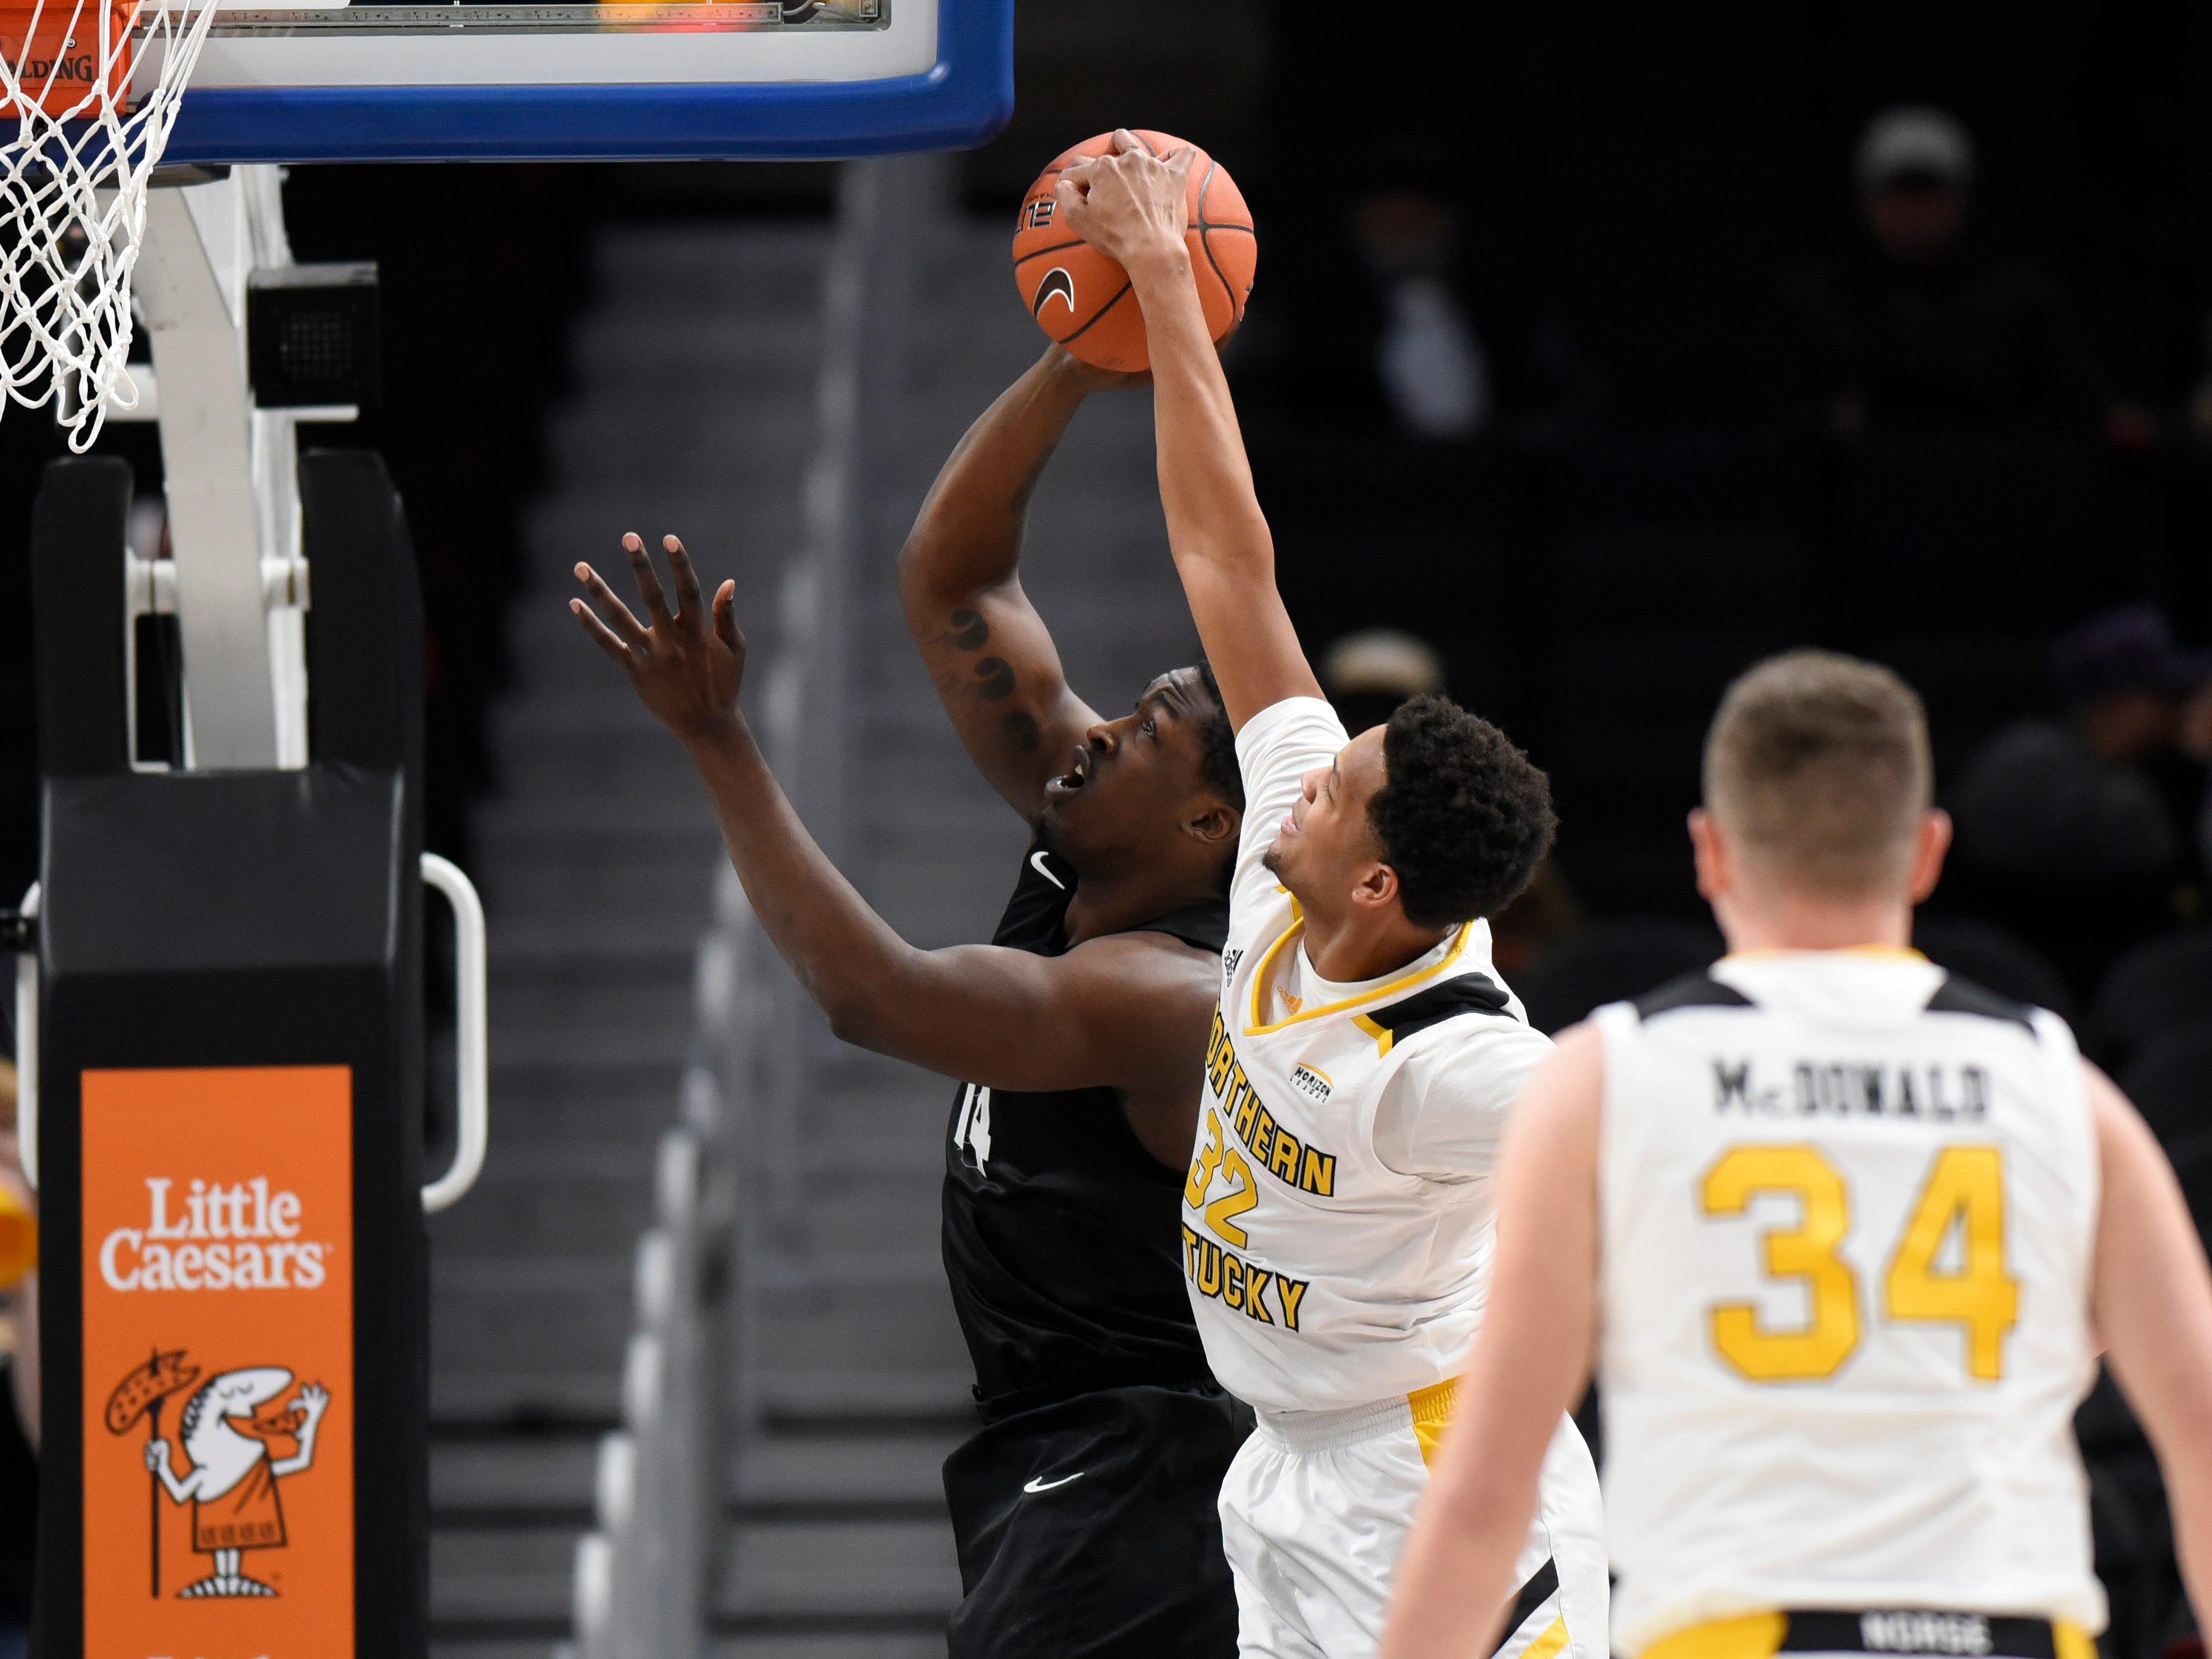 Northern Kentucky Norse forward Dantez Walton (32) blocks the shot of Oakland Golden Grizzlies forward Xavier Hill-Mais during the first half.